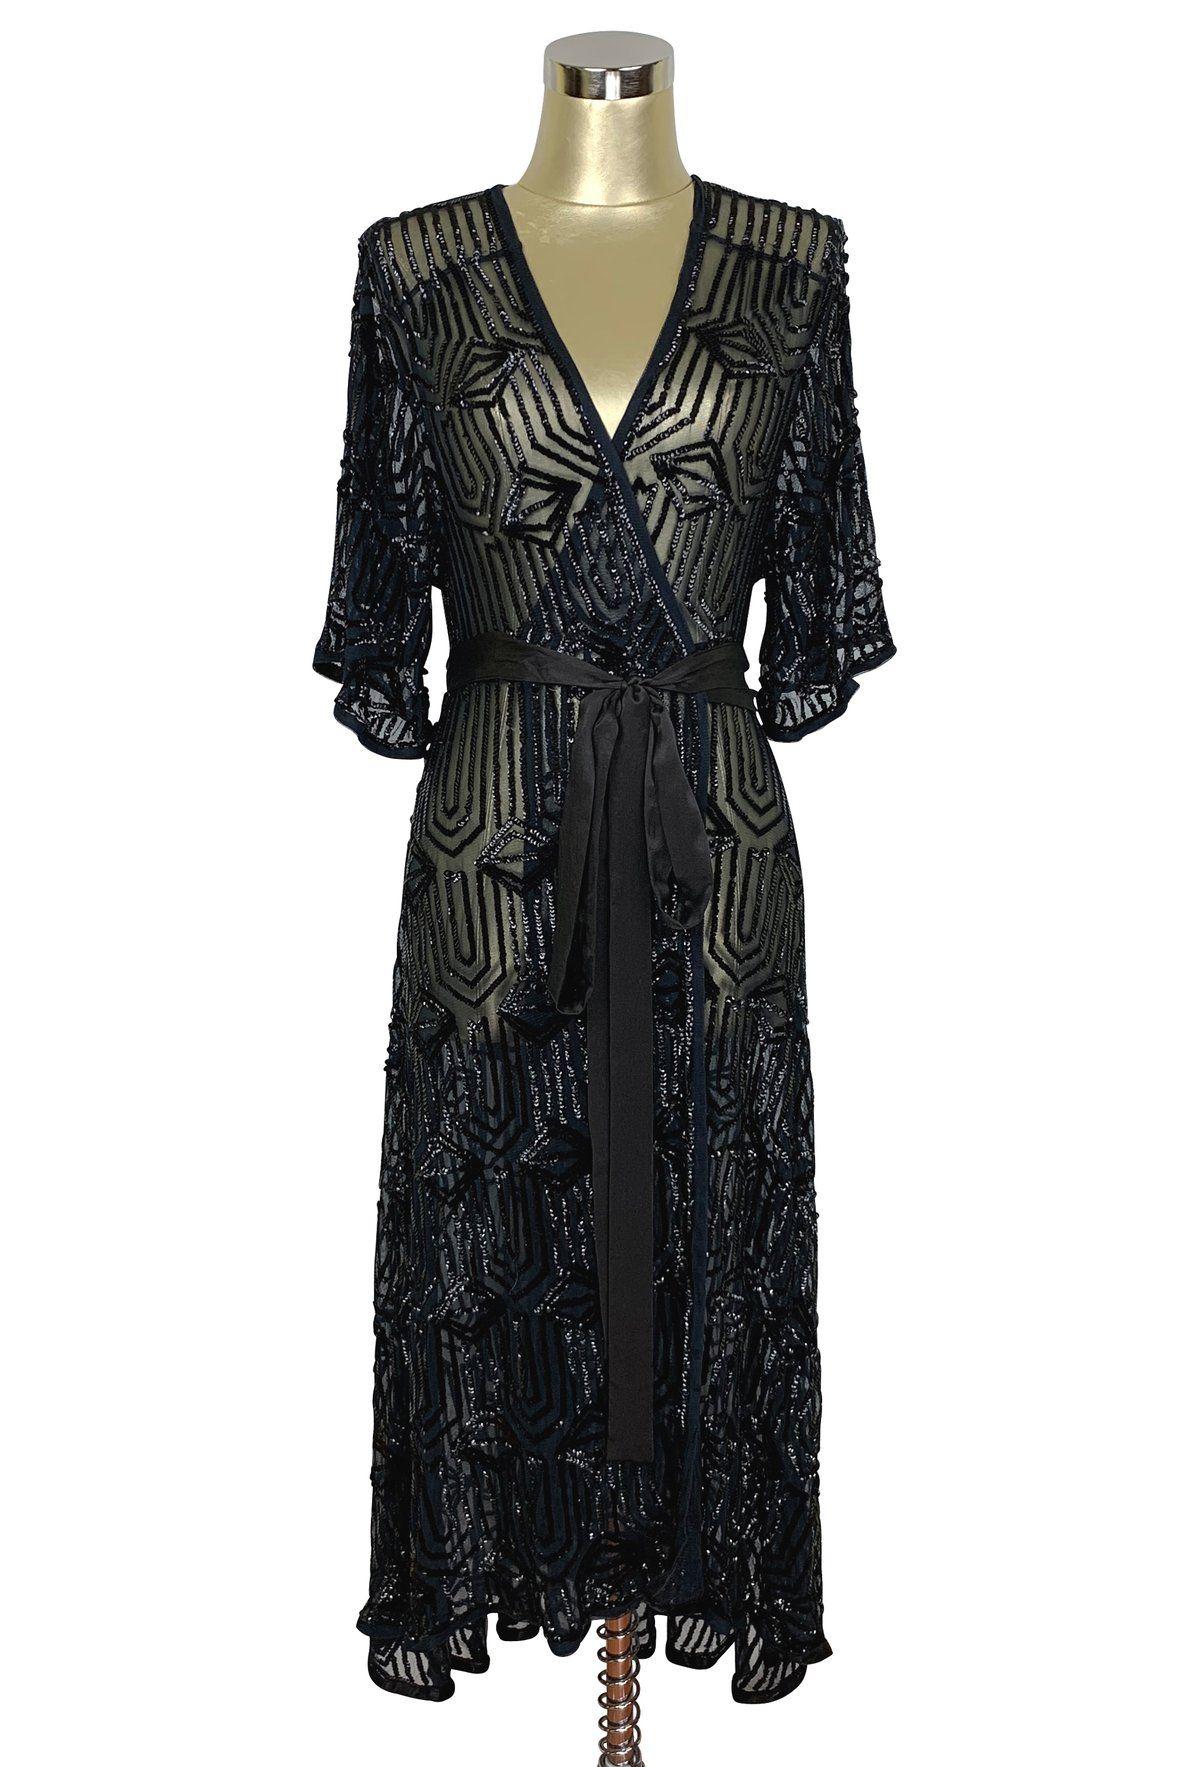 Vintage Ditsy Floral Wrap Dress Wrap Dress Floral Retro Wrap Dress Pretty Dresses [ 1500 x 1000 Pixel ]